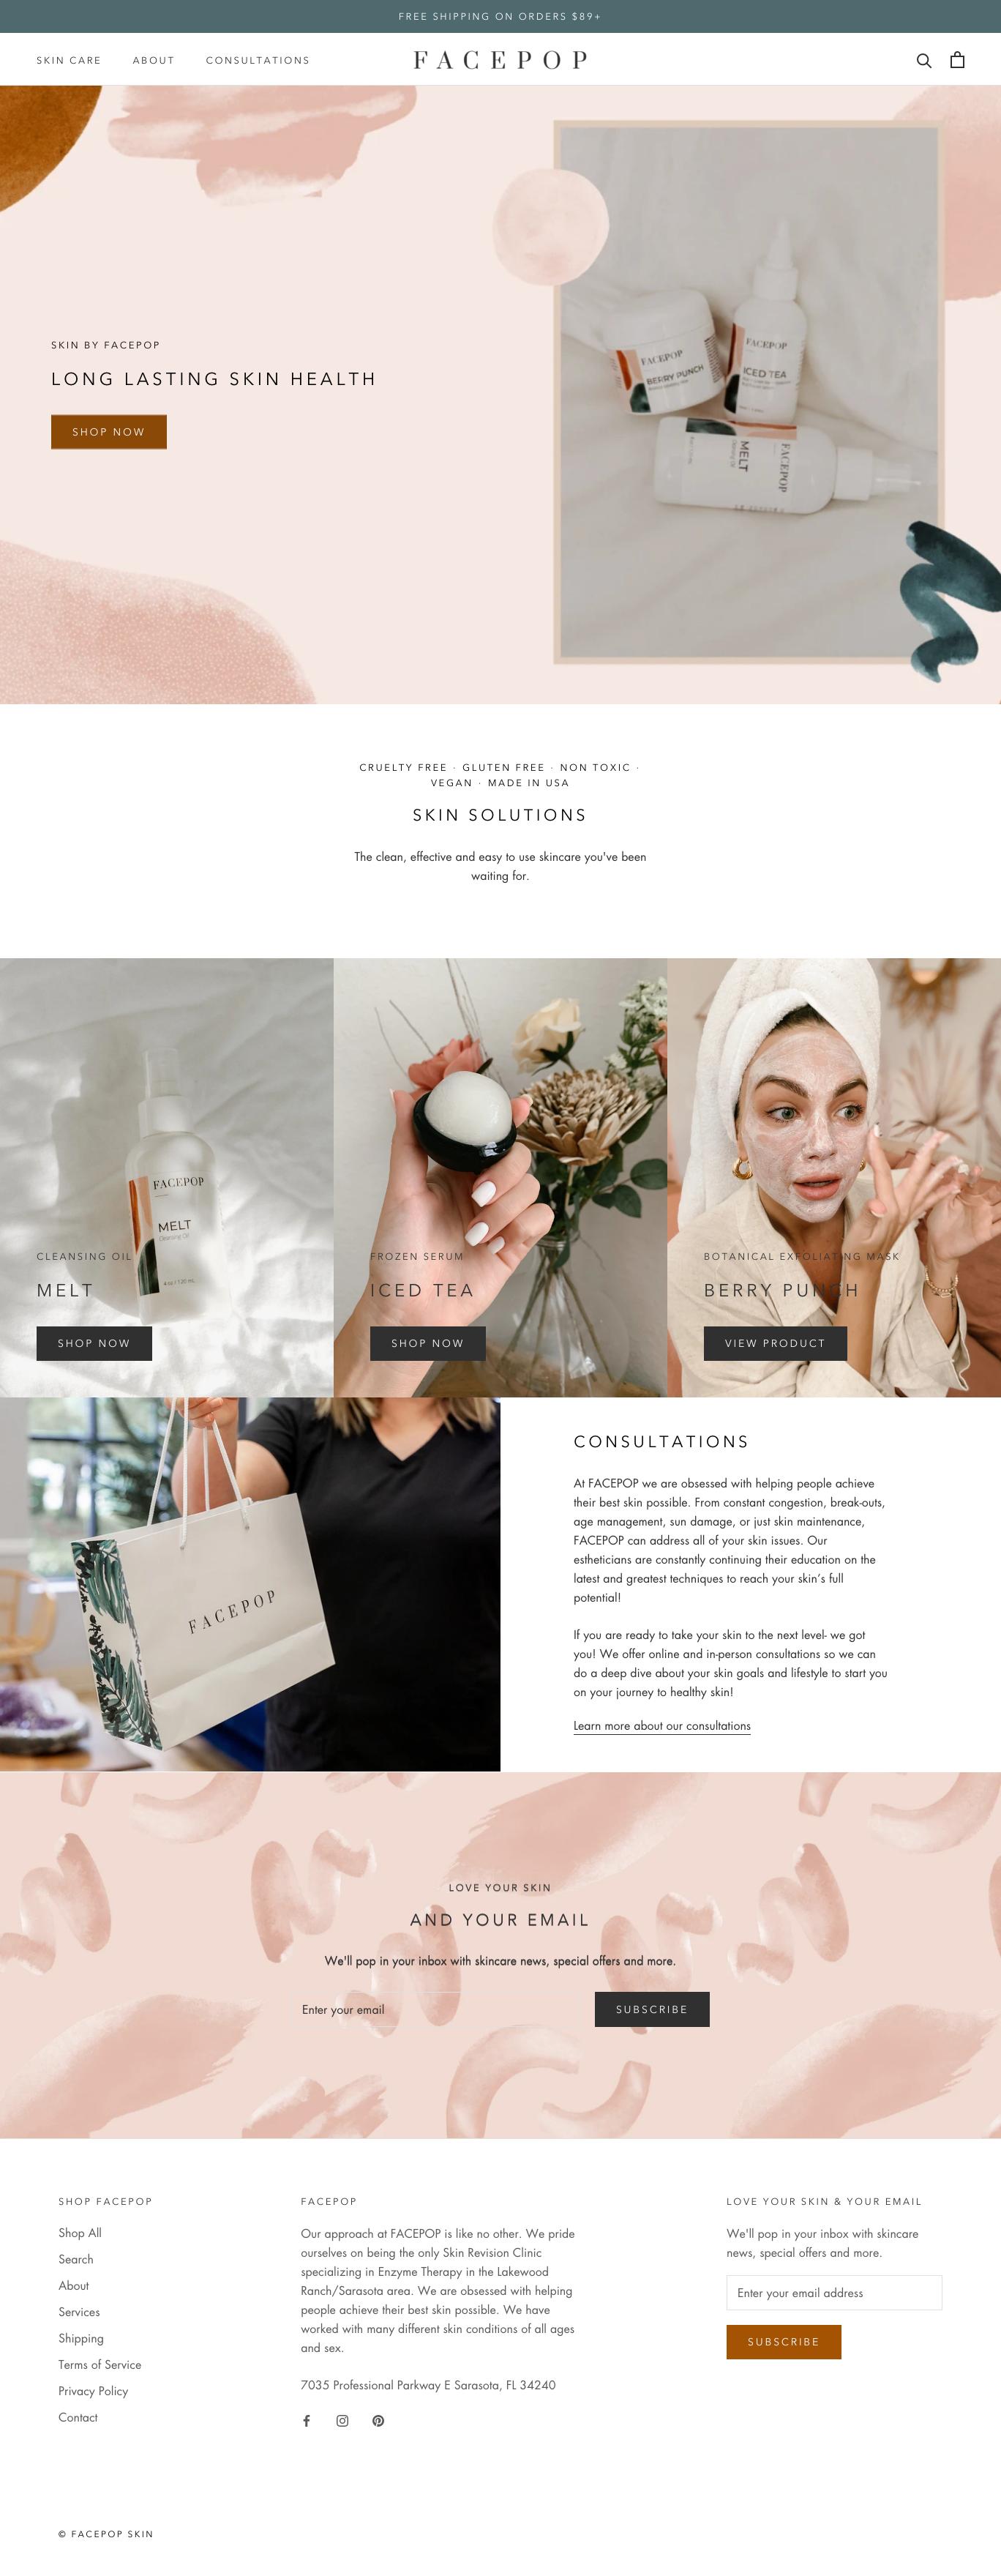 facepop homepage design screenshot in shopify